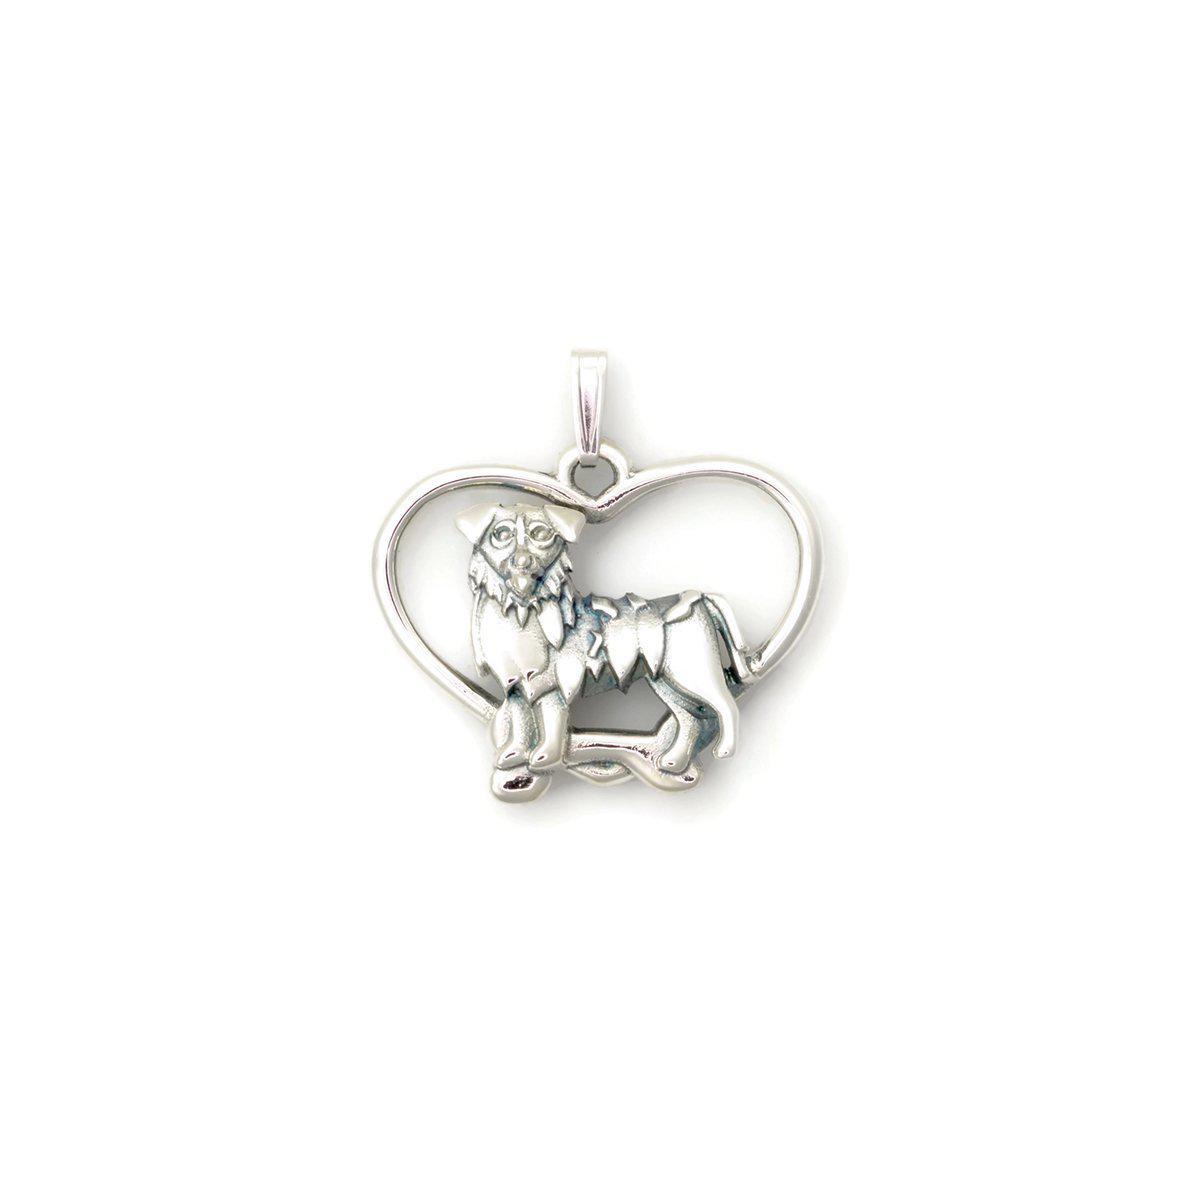 Donna Pizarro Designs Sterling Silver Cocker Spaniel Necklace tWuW0ajKI0